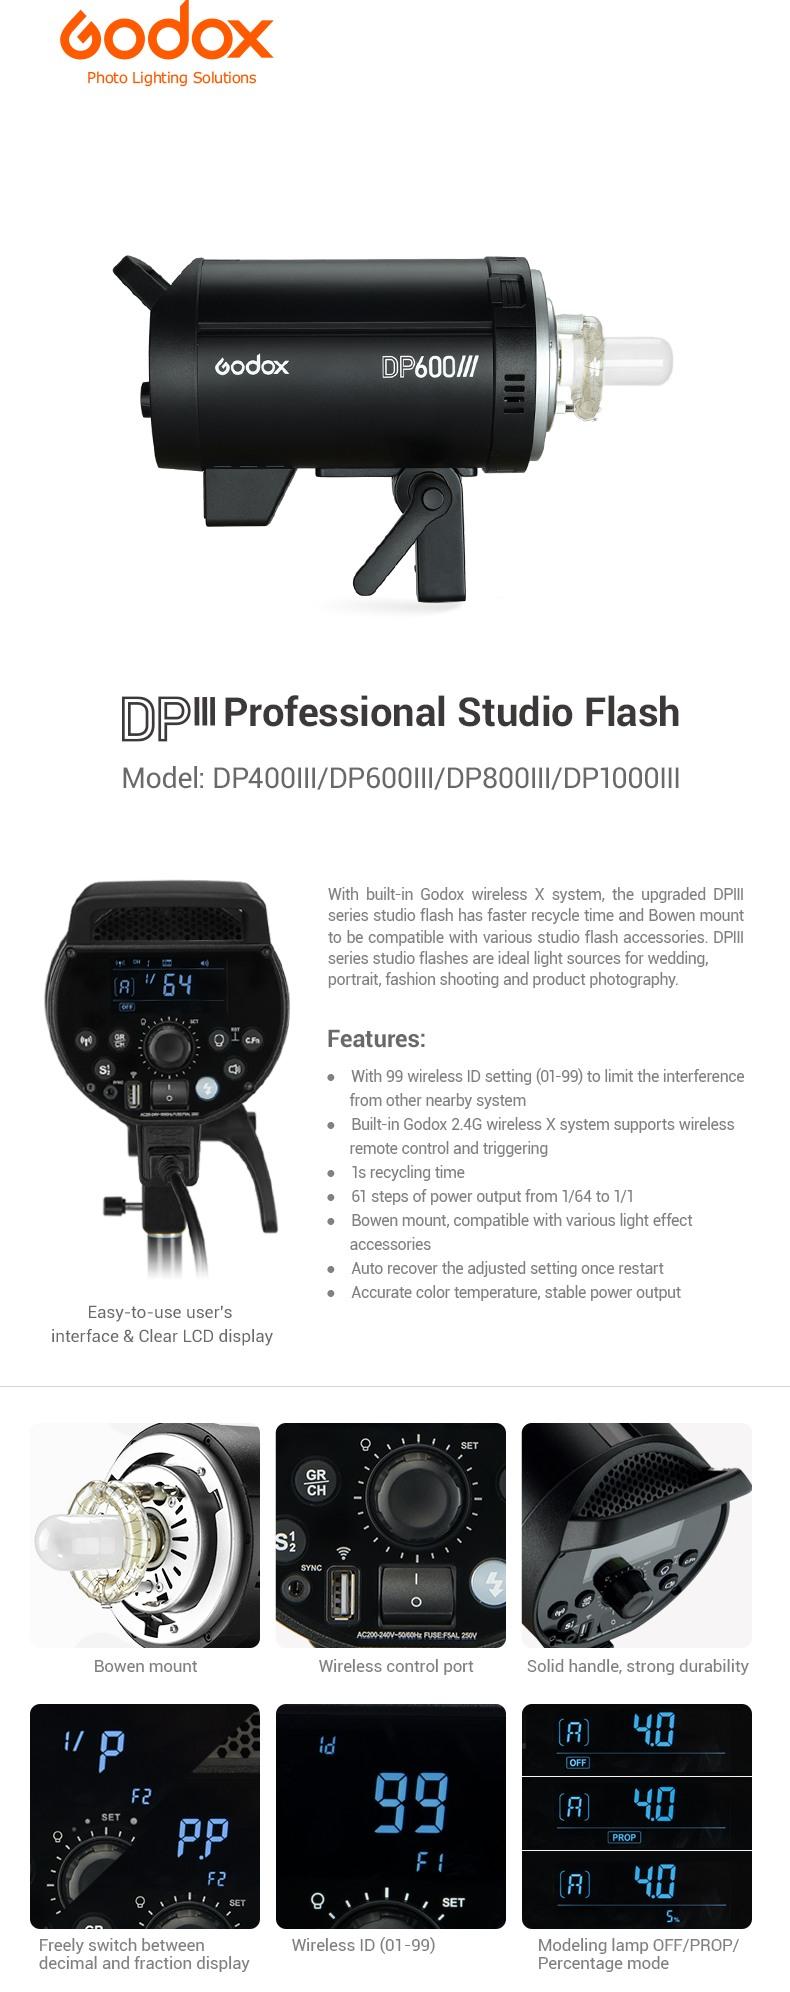 Godox DP III Professional Studio Flash. Model: DP400III, DP600III, DP800III, DP1000III. Features, LCD panel.